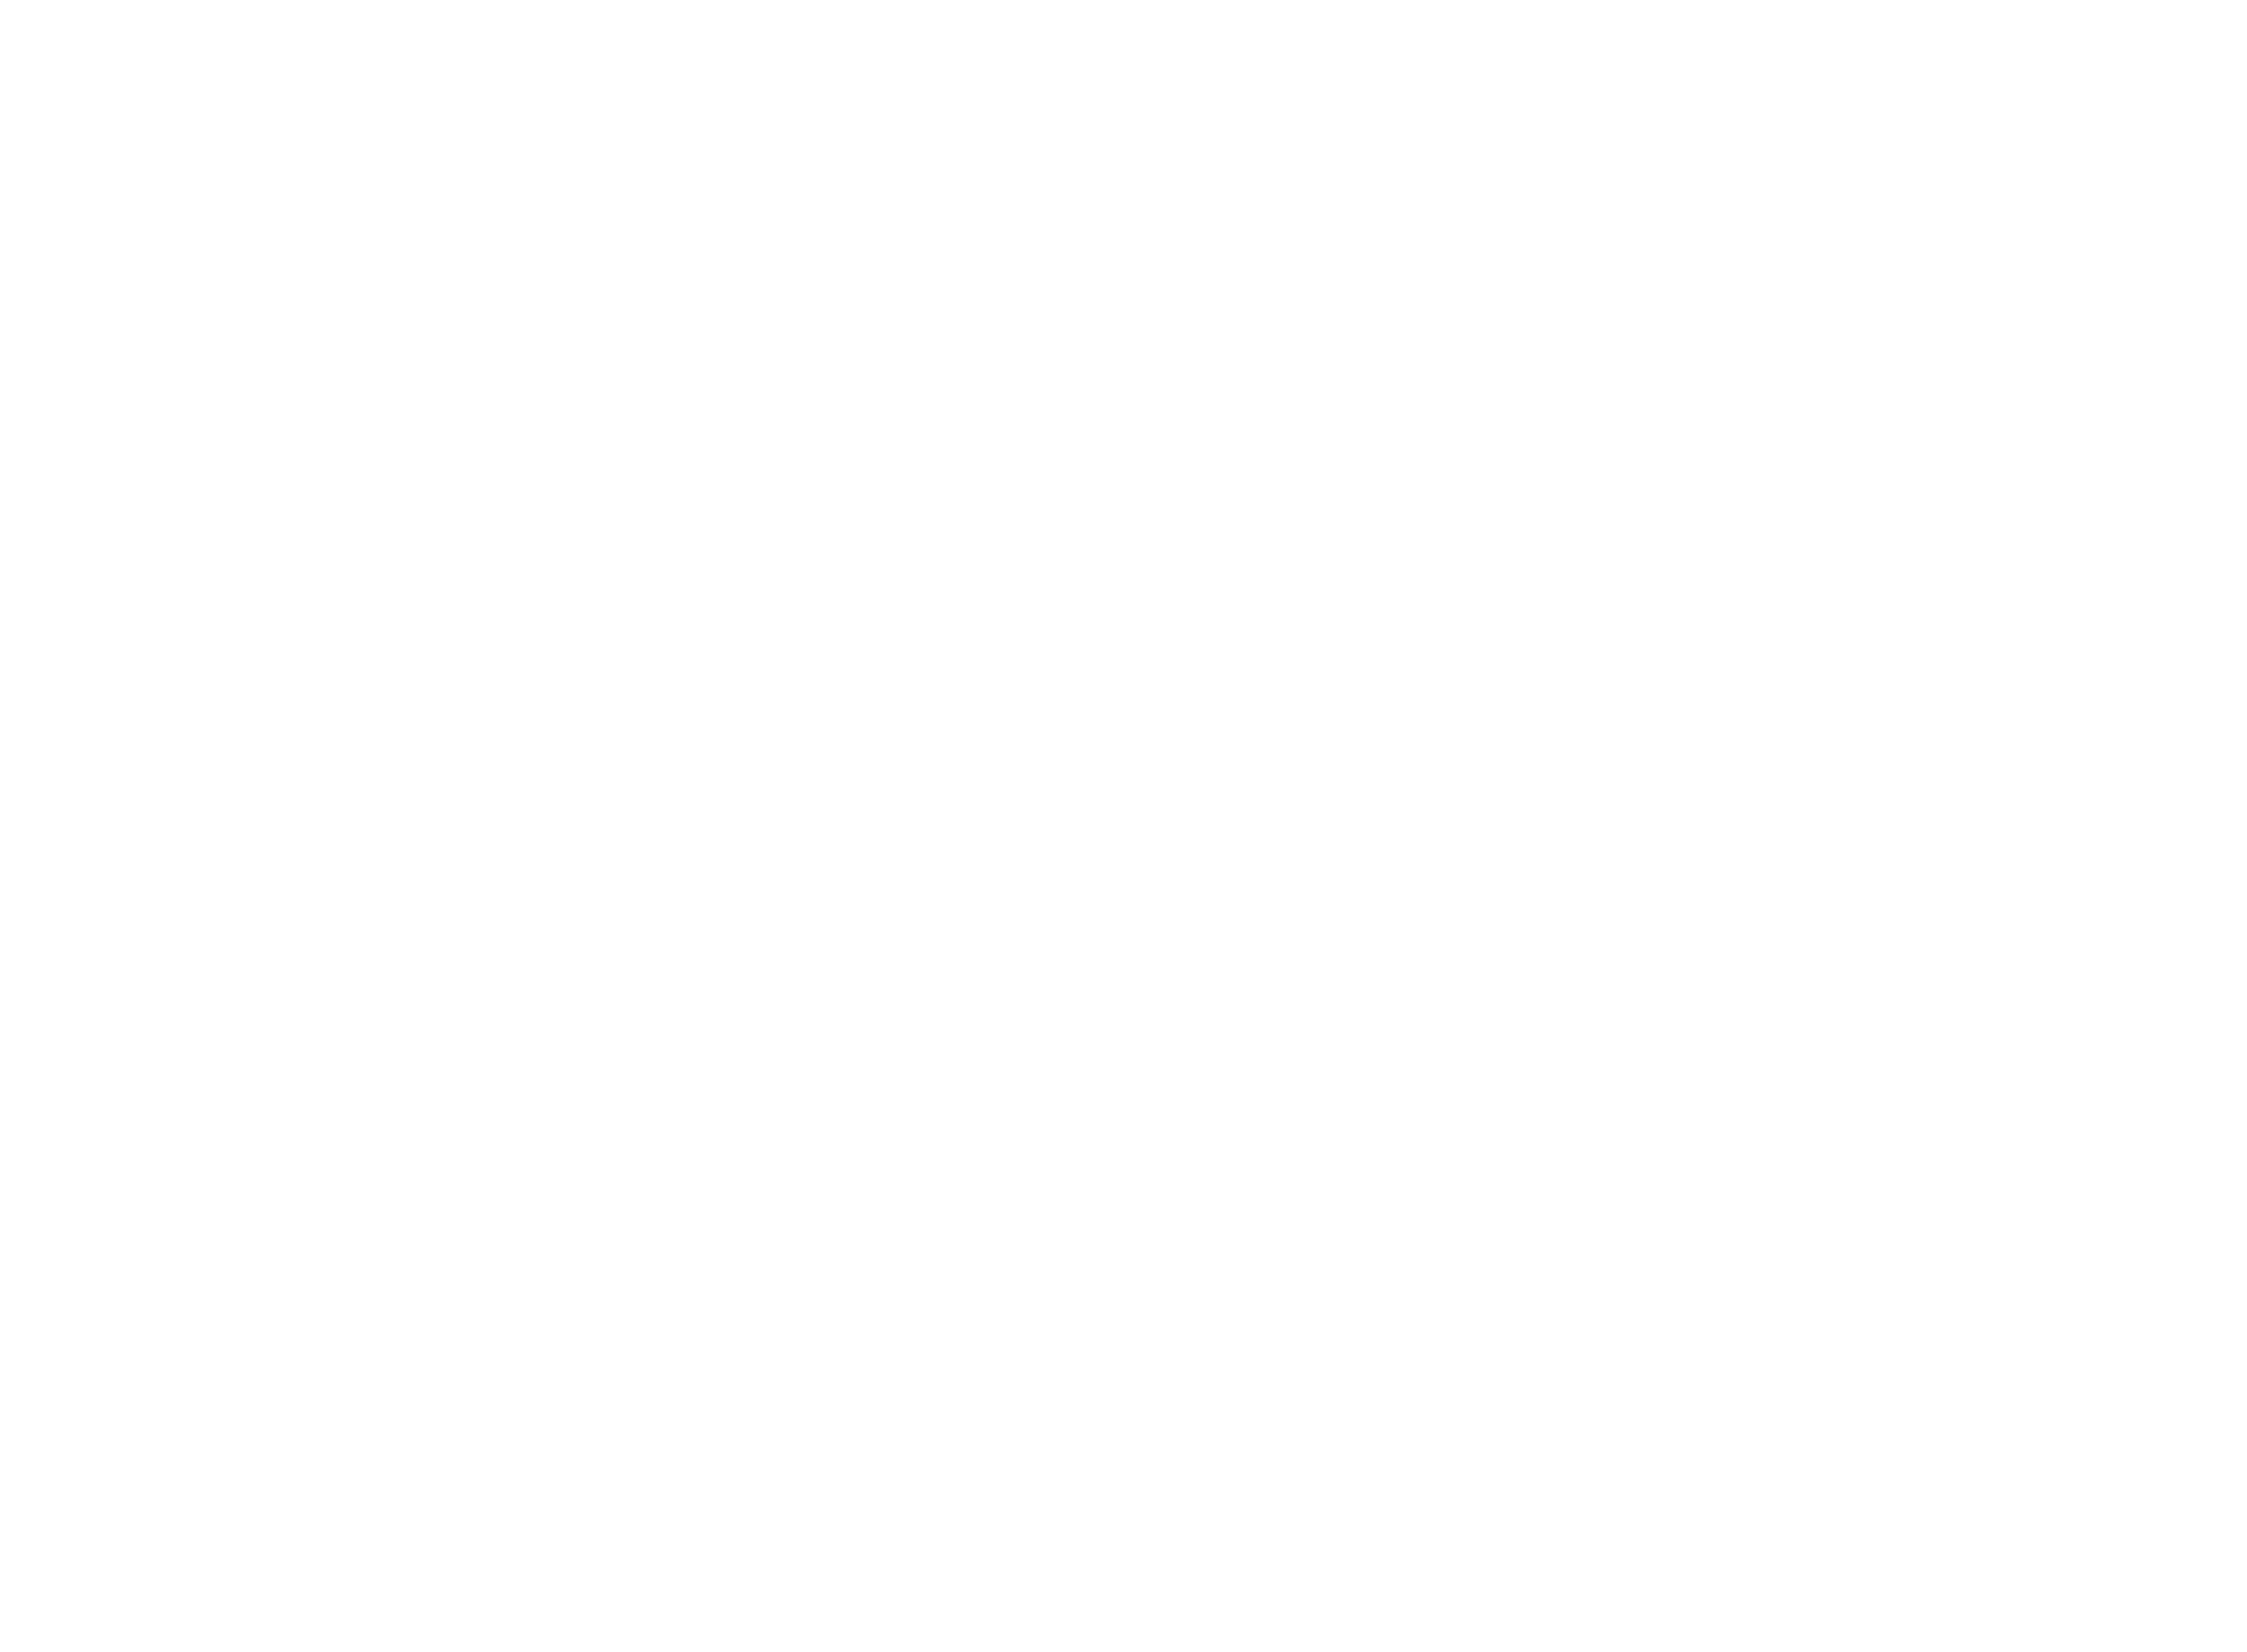 PH Resorts Group